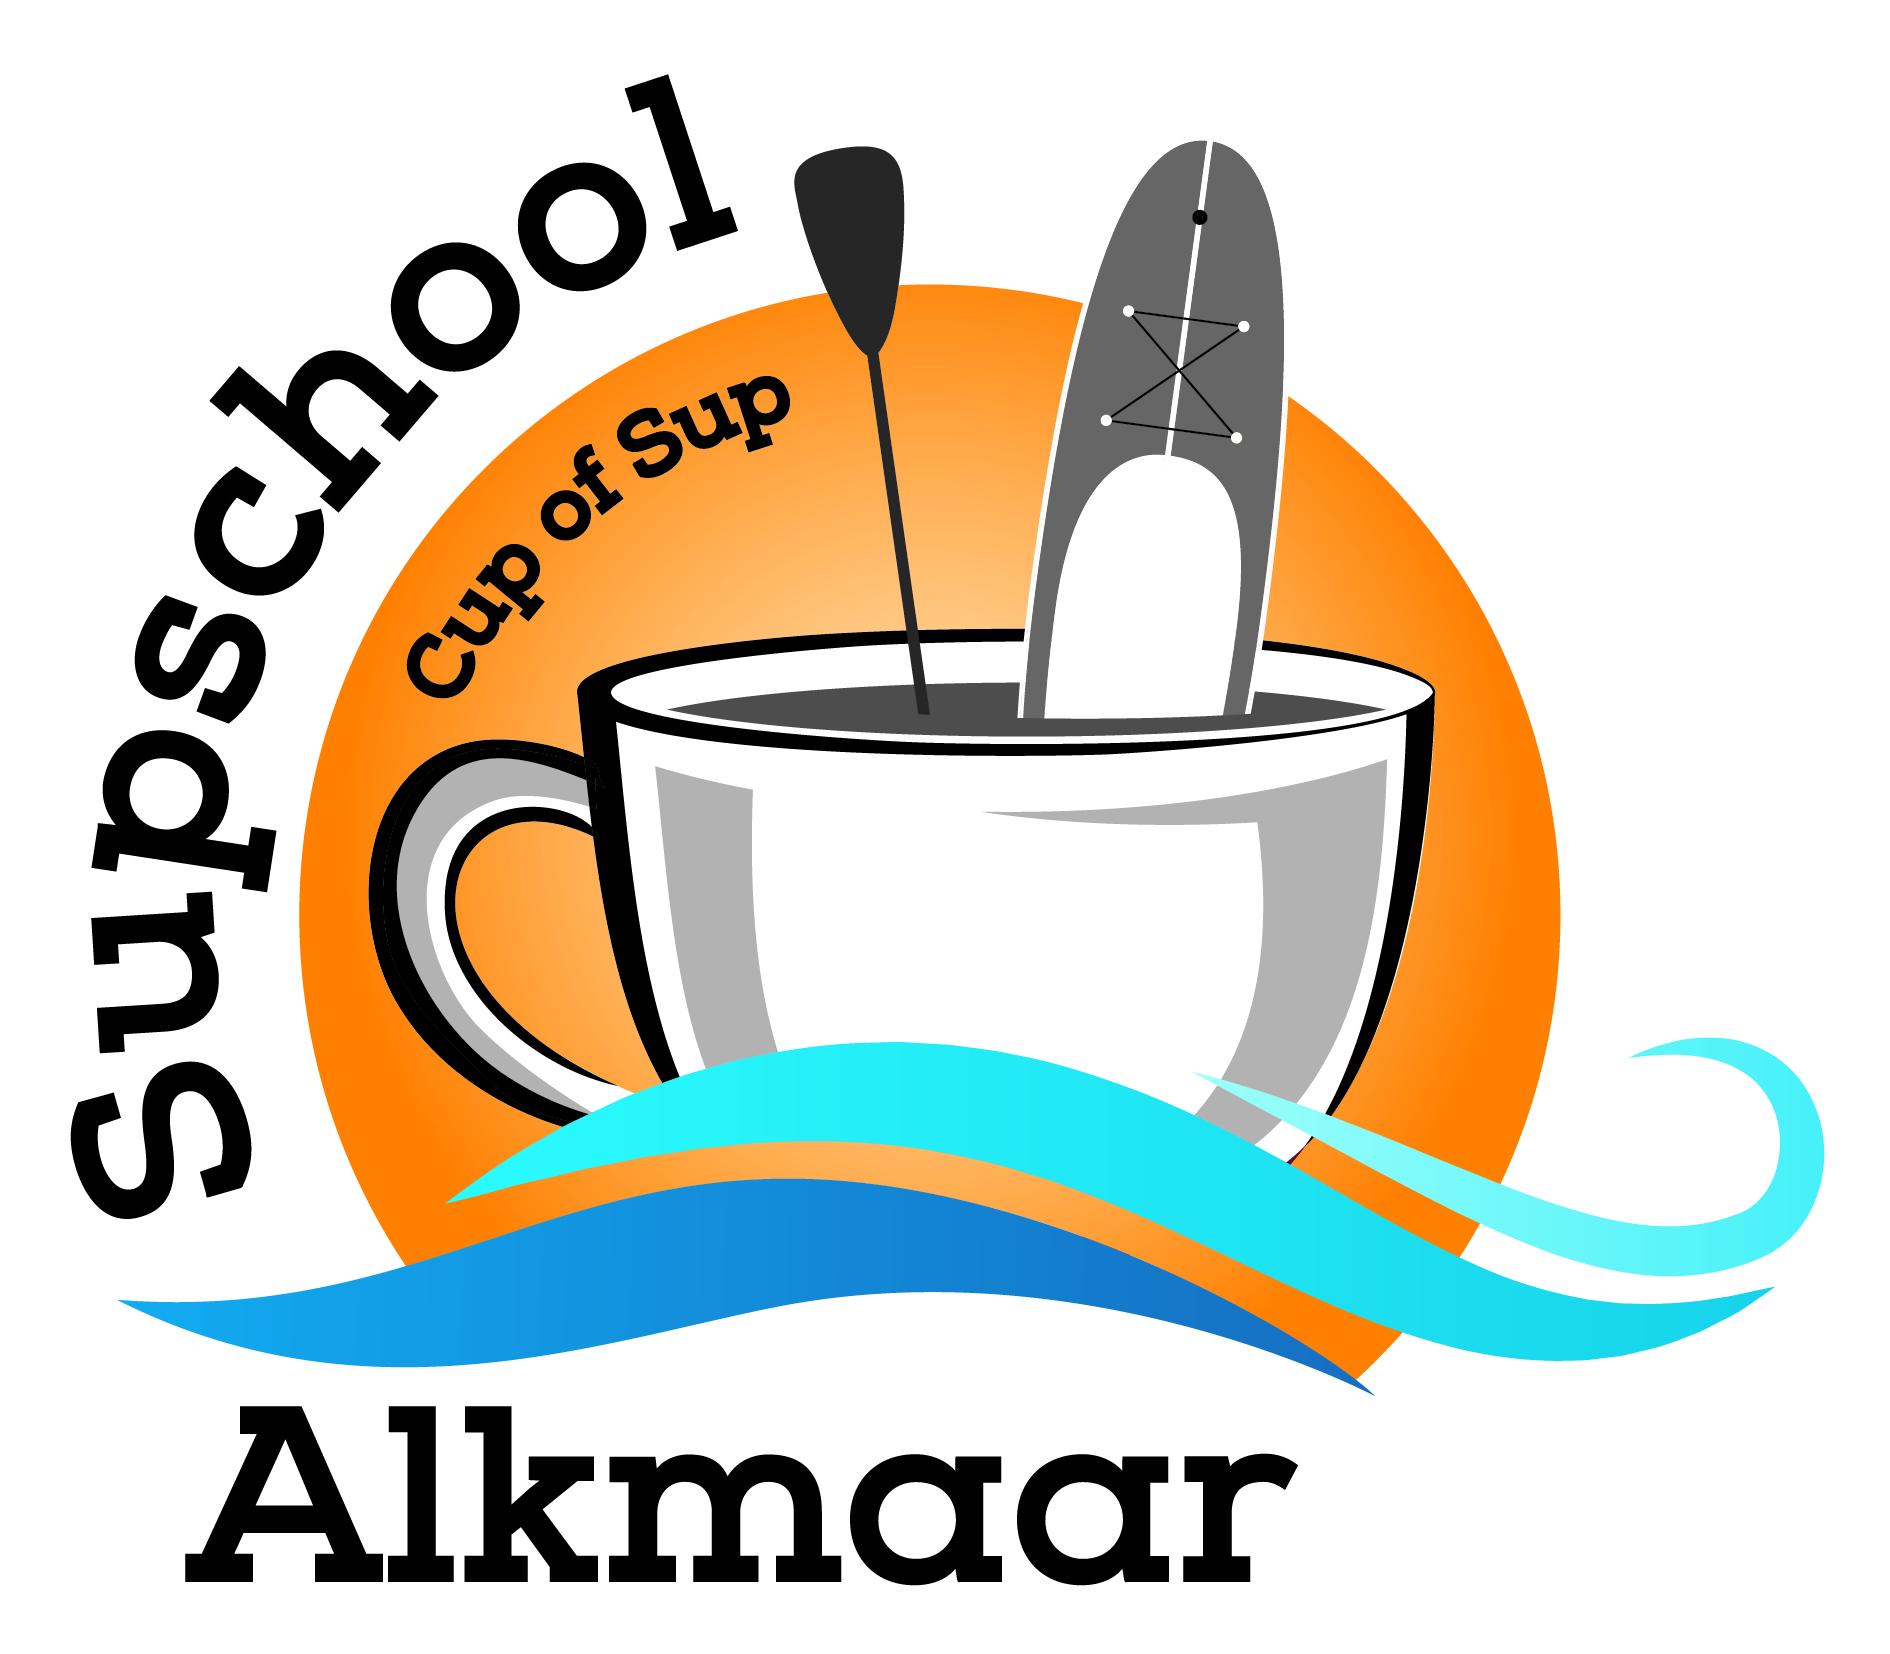 www.supschoolalkmaar.nl